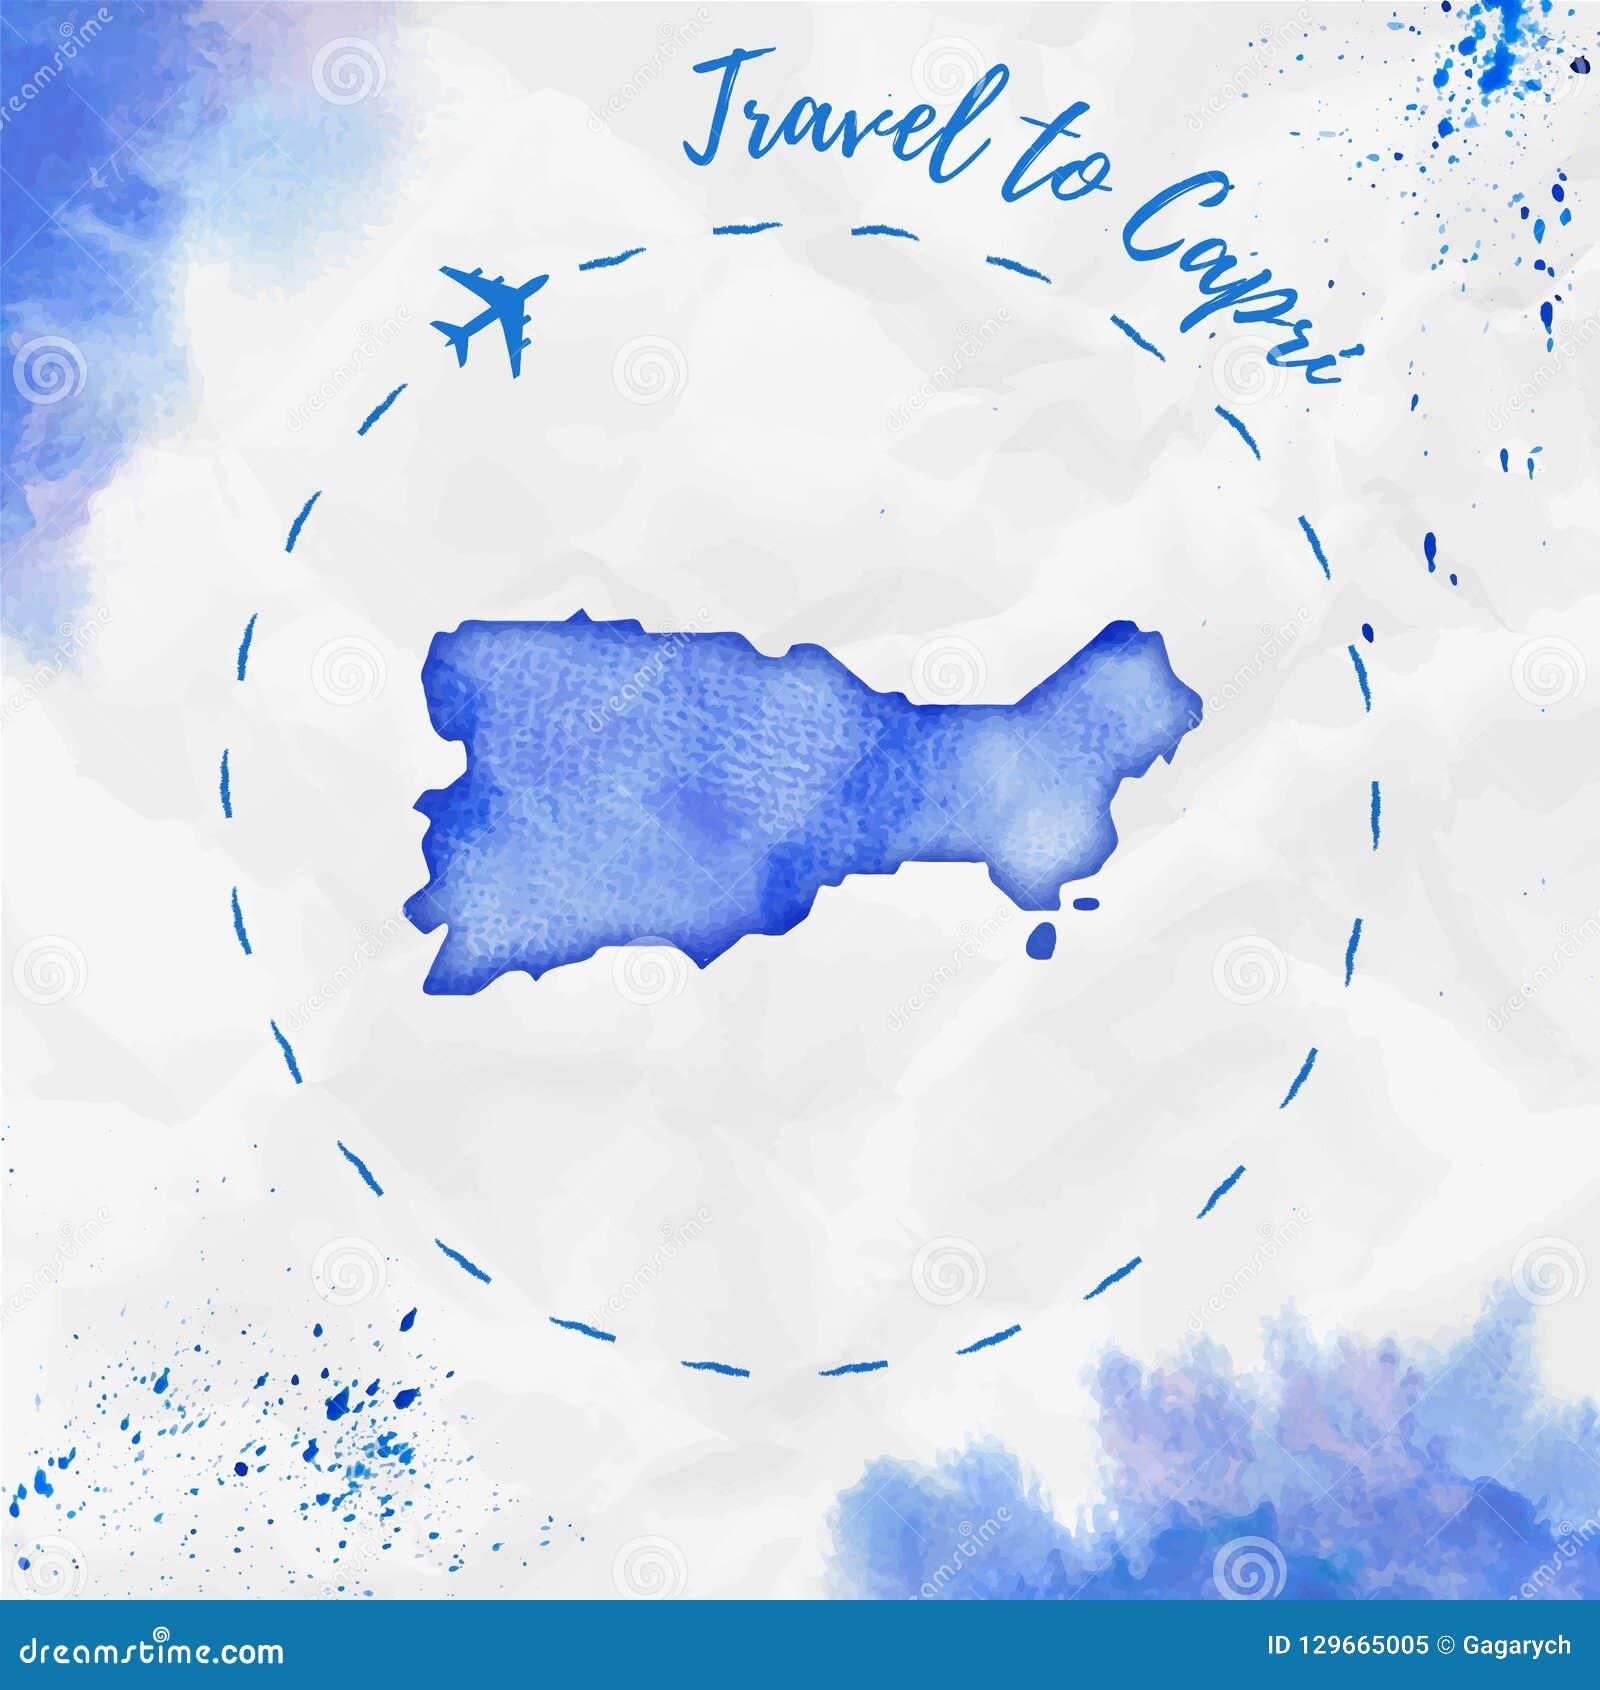 Capri Watercolor Island Map In Blue Colors. Stock Vector ... on